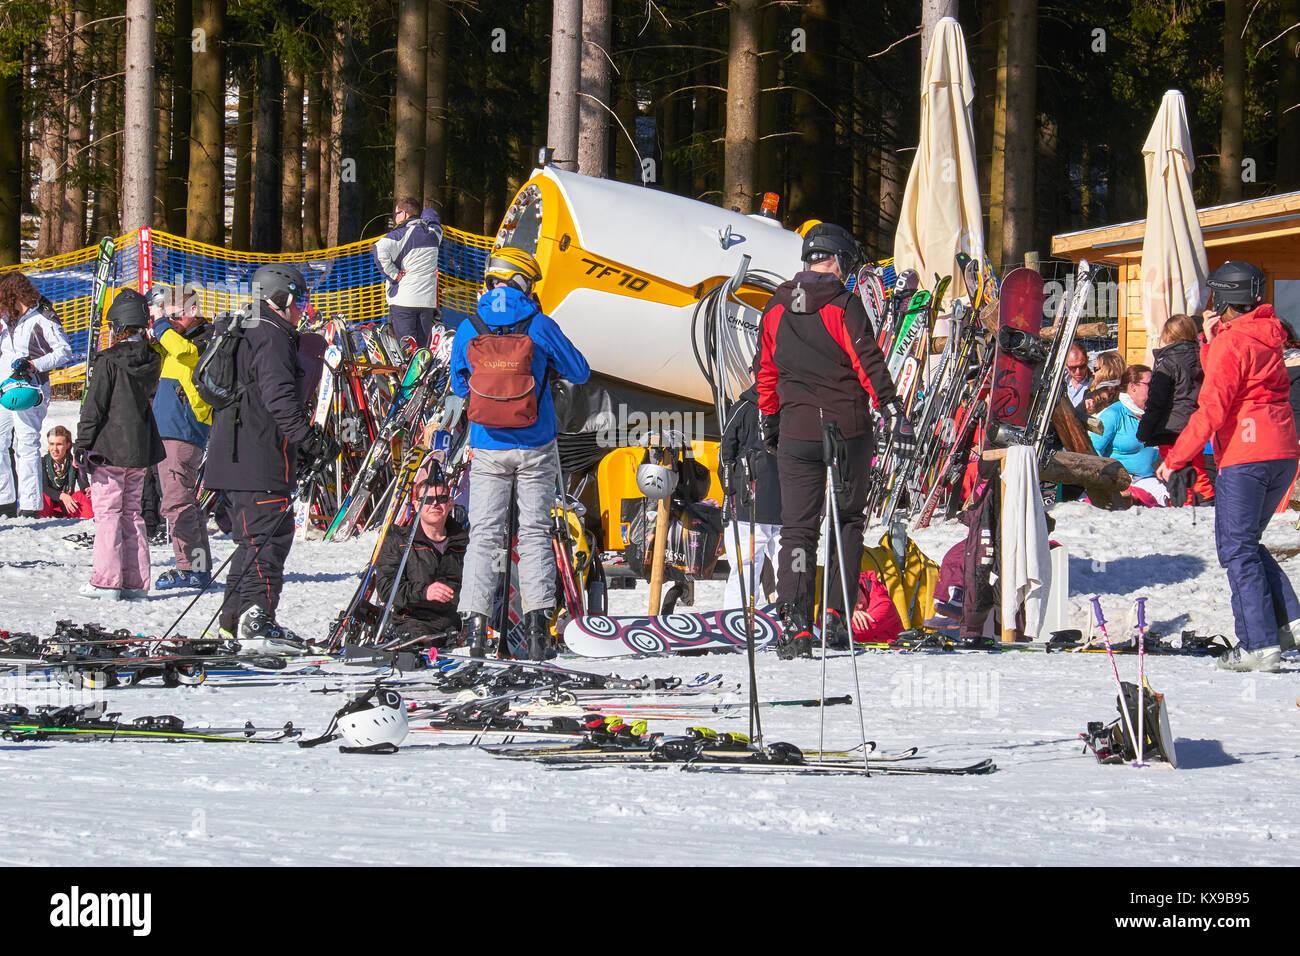 WINTERBERG, GERMANY - FEBRUARY 15, 2017: Skiers taking a break at noon in the sun at Ski Carousel Winterberg - Stock Image